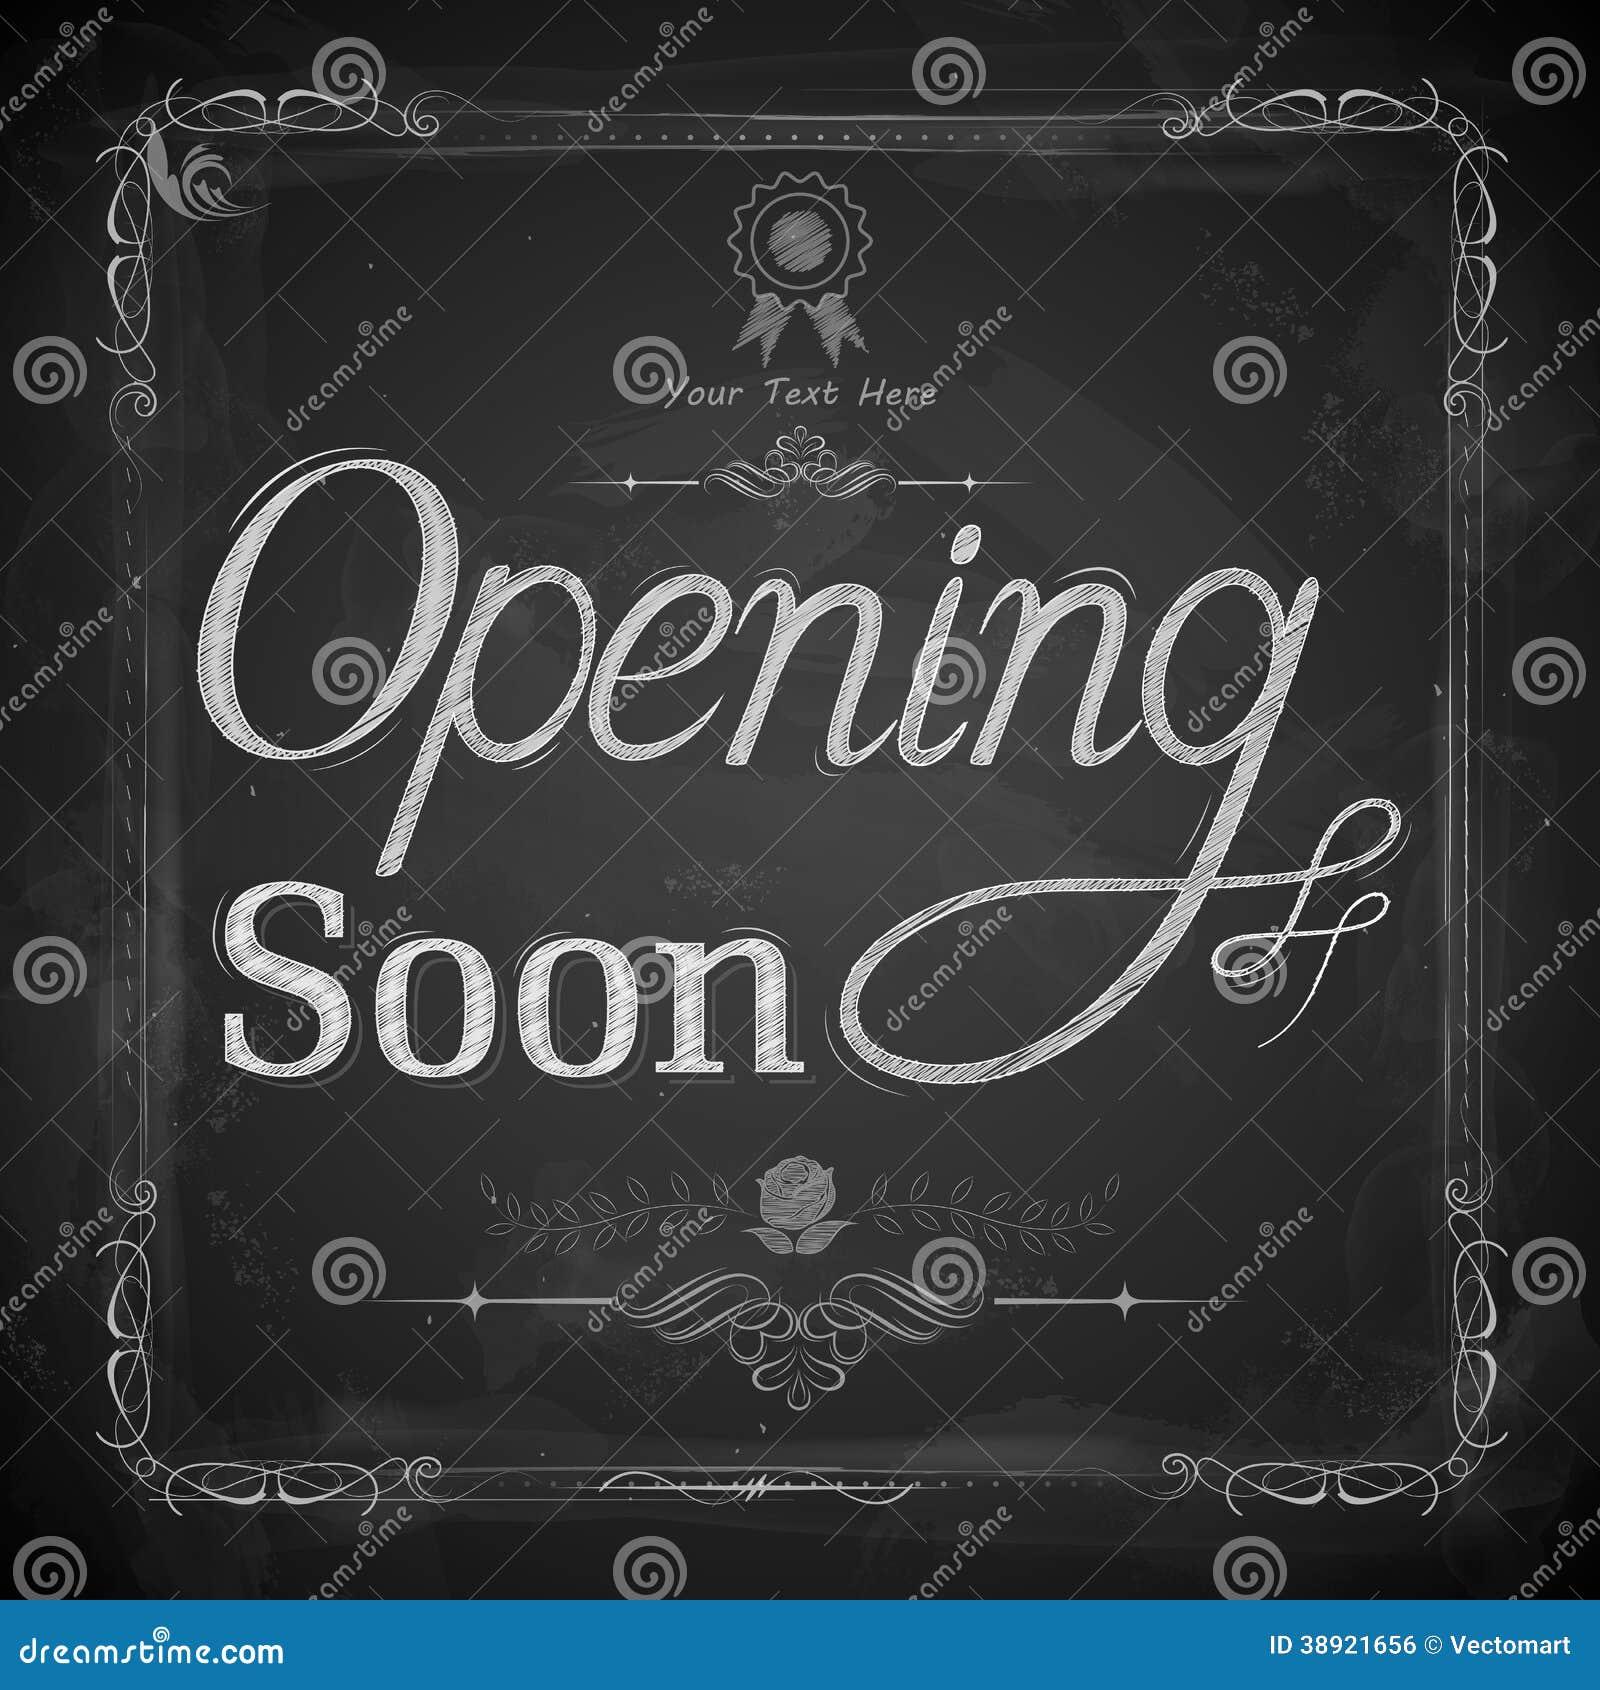 Opening Soon Written On Chalkboard Stock Vector Image